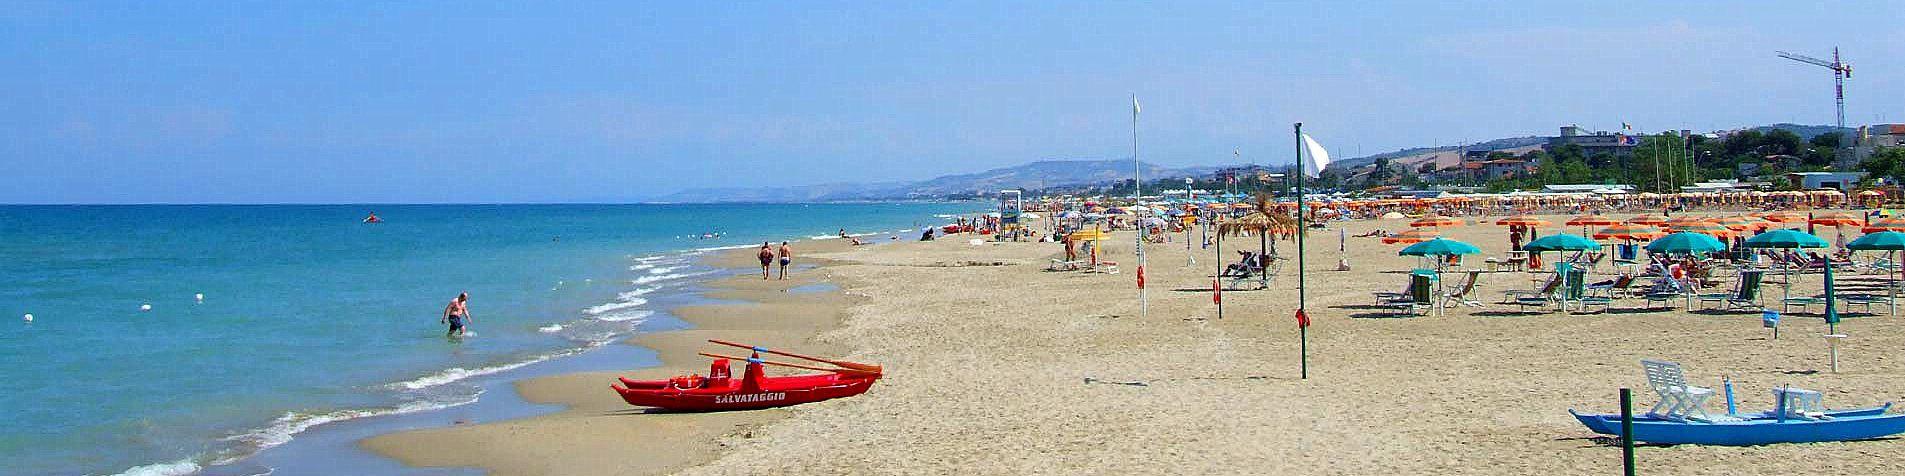 Alba Adriatica a její písečná pláž